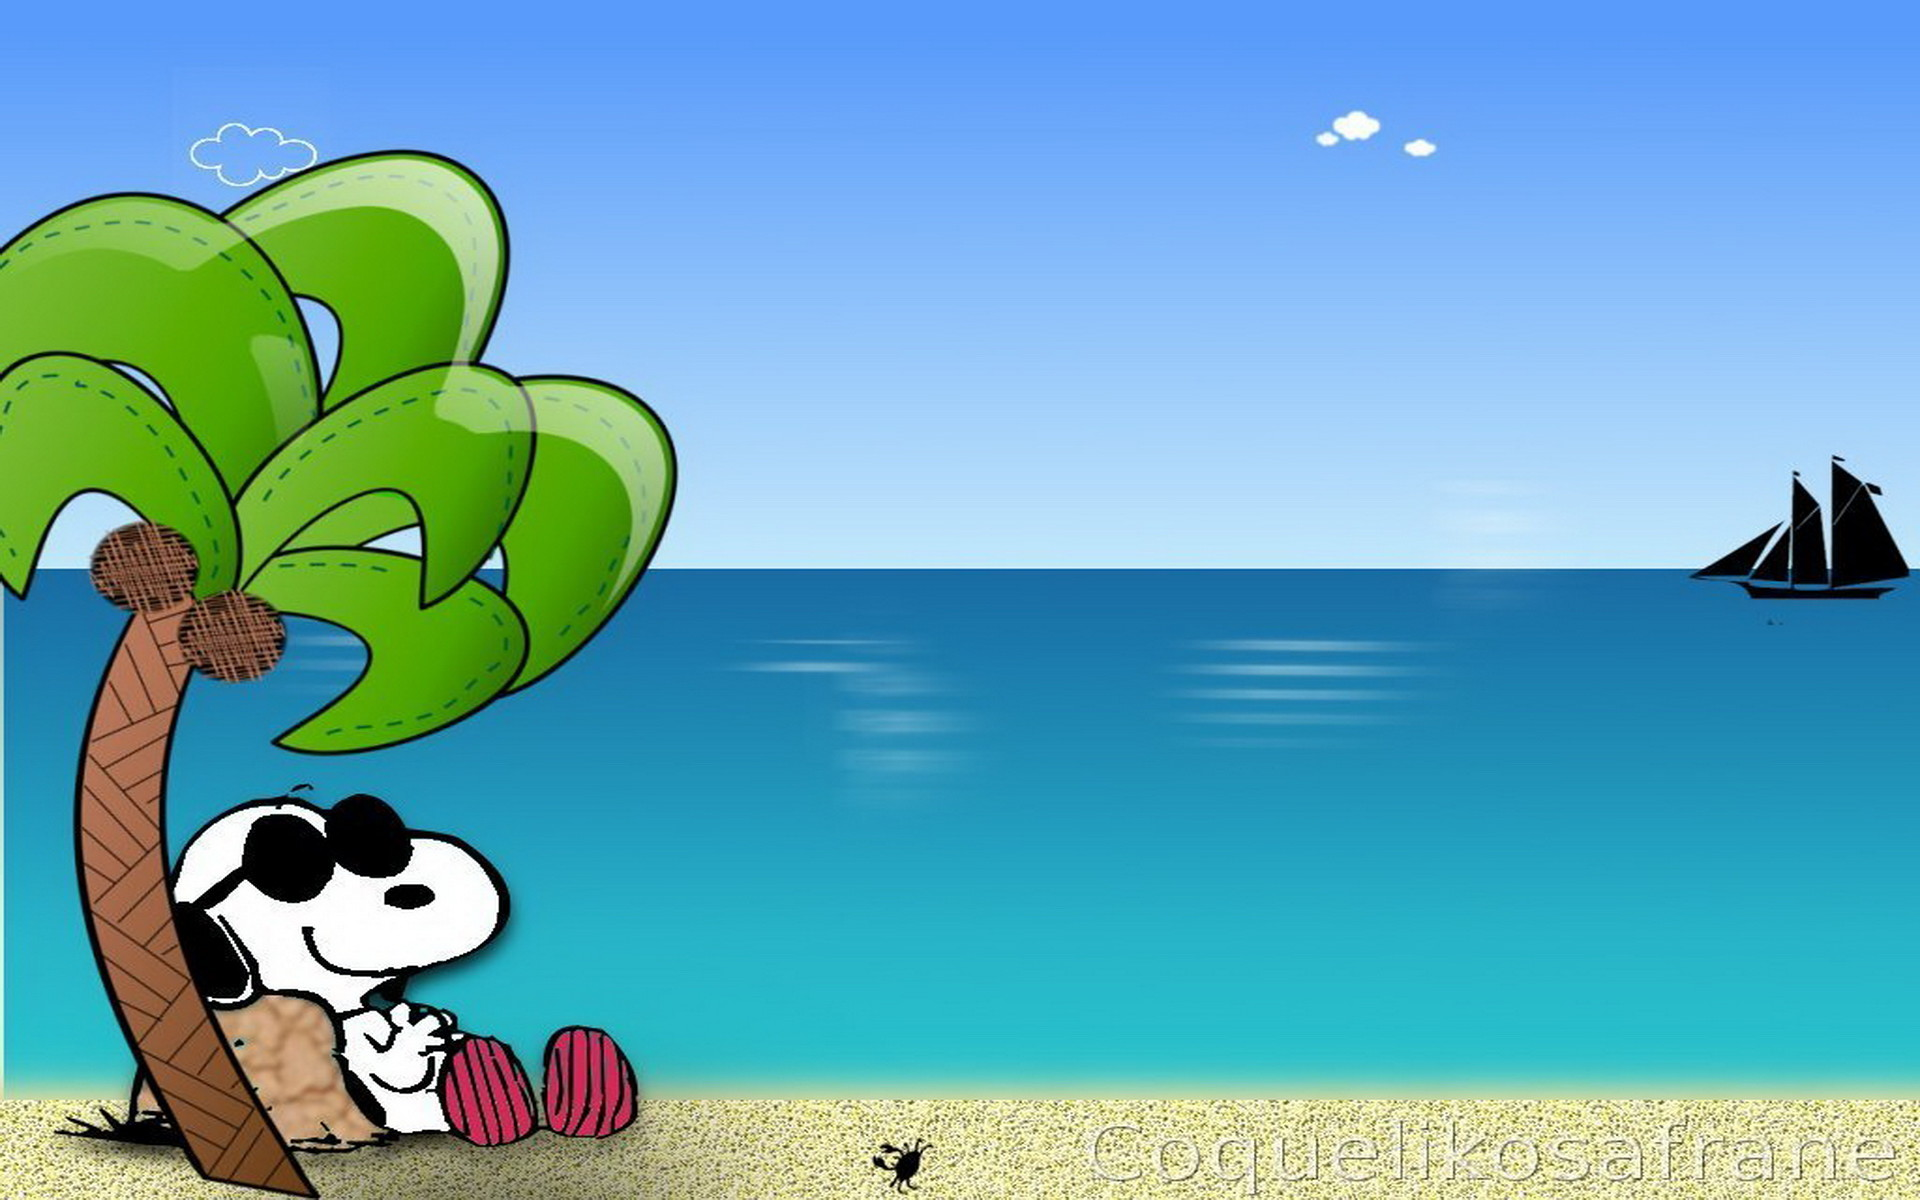 Snoopy Wallpapers, Snoopy Wallpaper 49.jpg 1920×1200